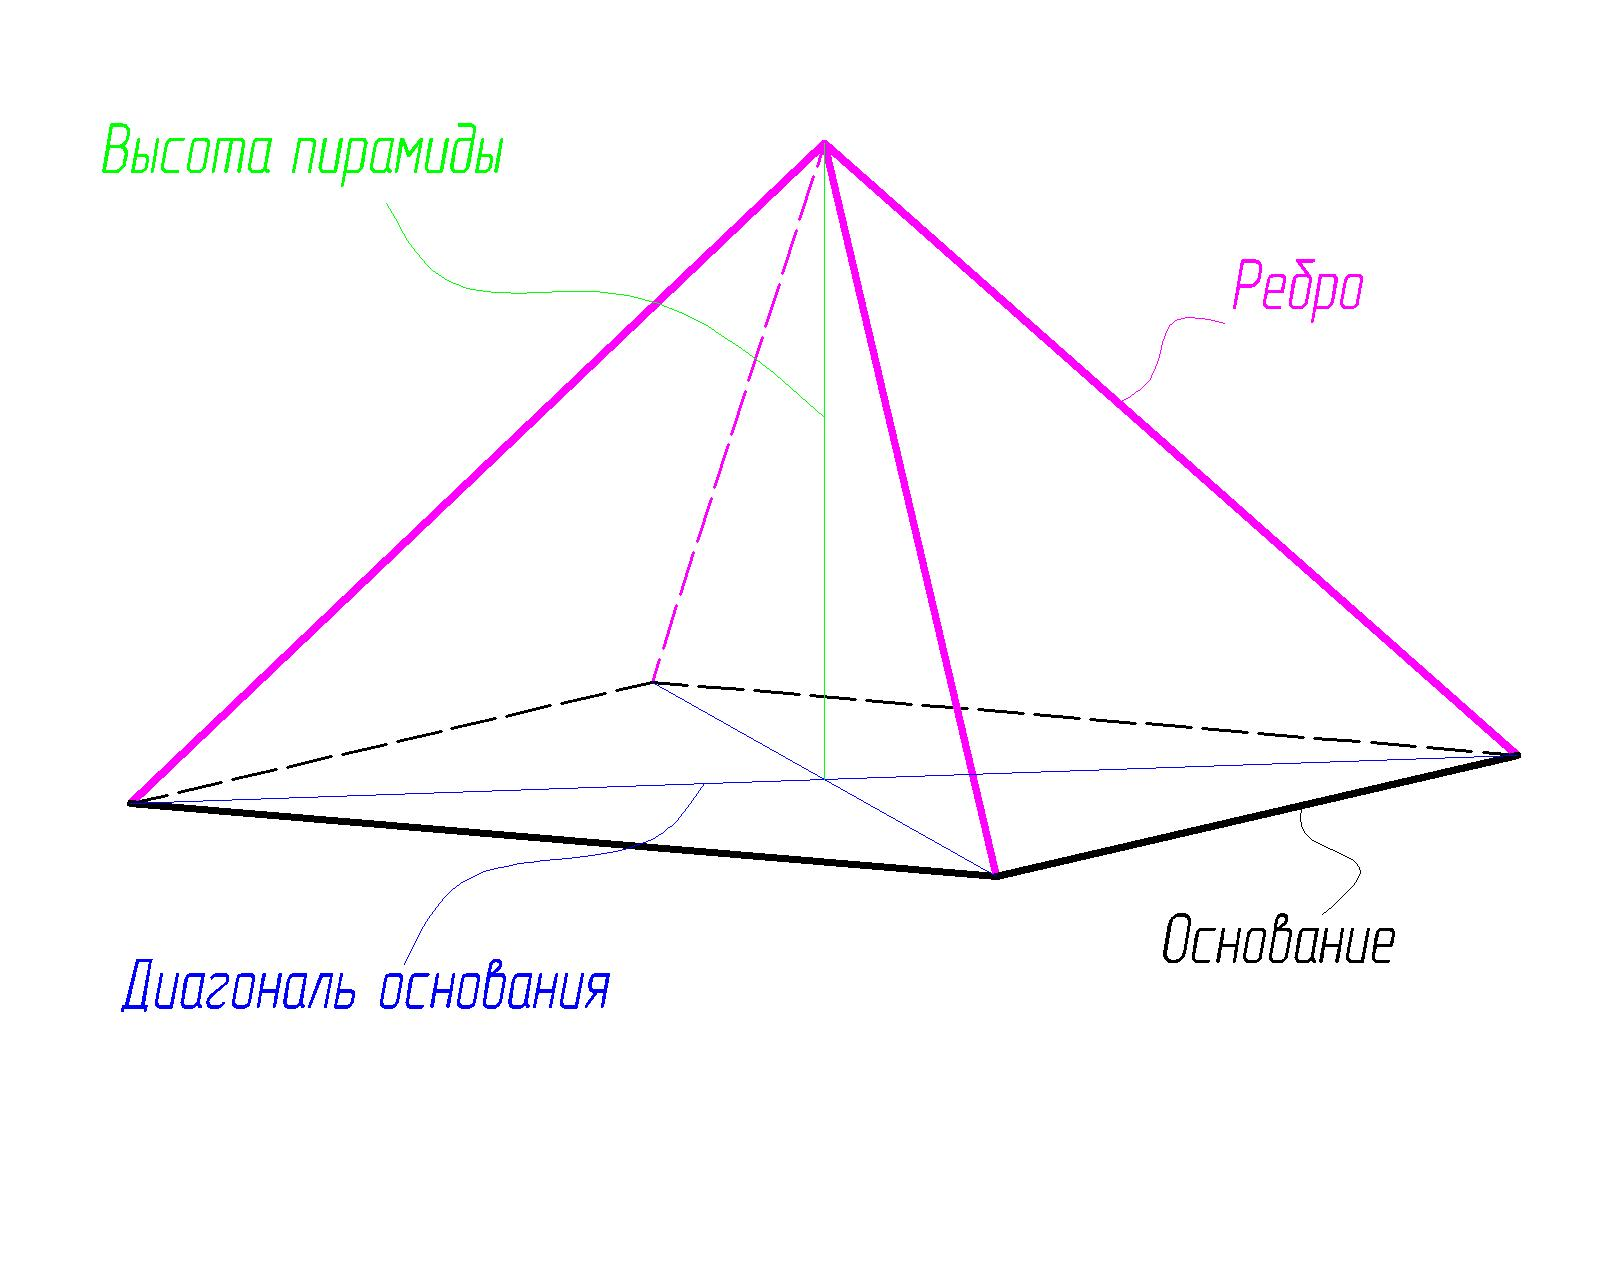 Лечебная пирамида чертежи своими руками